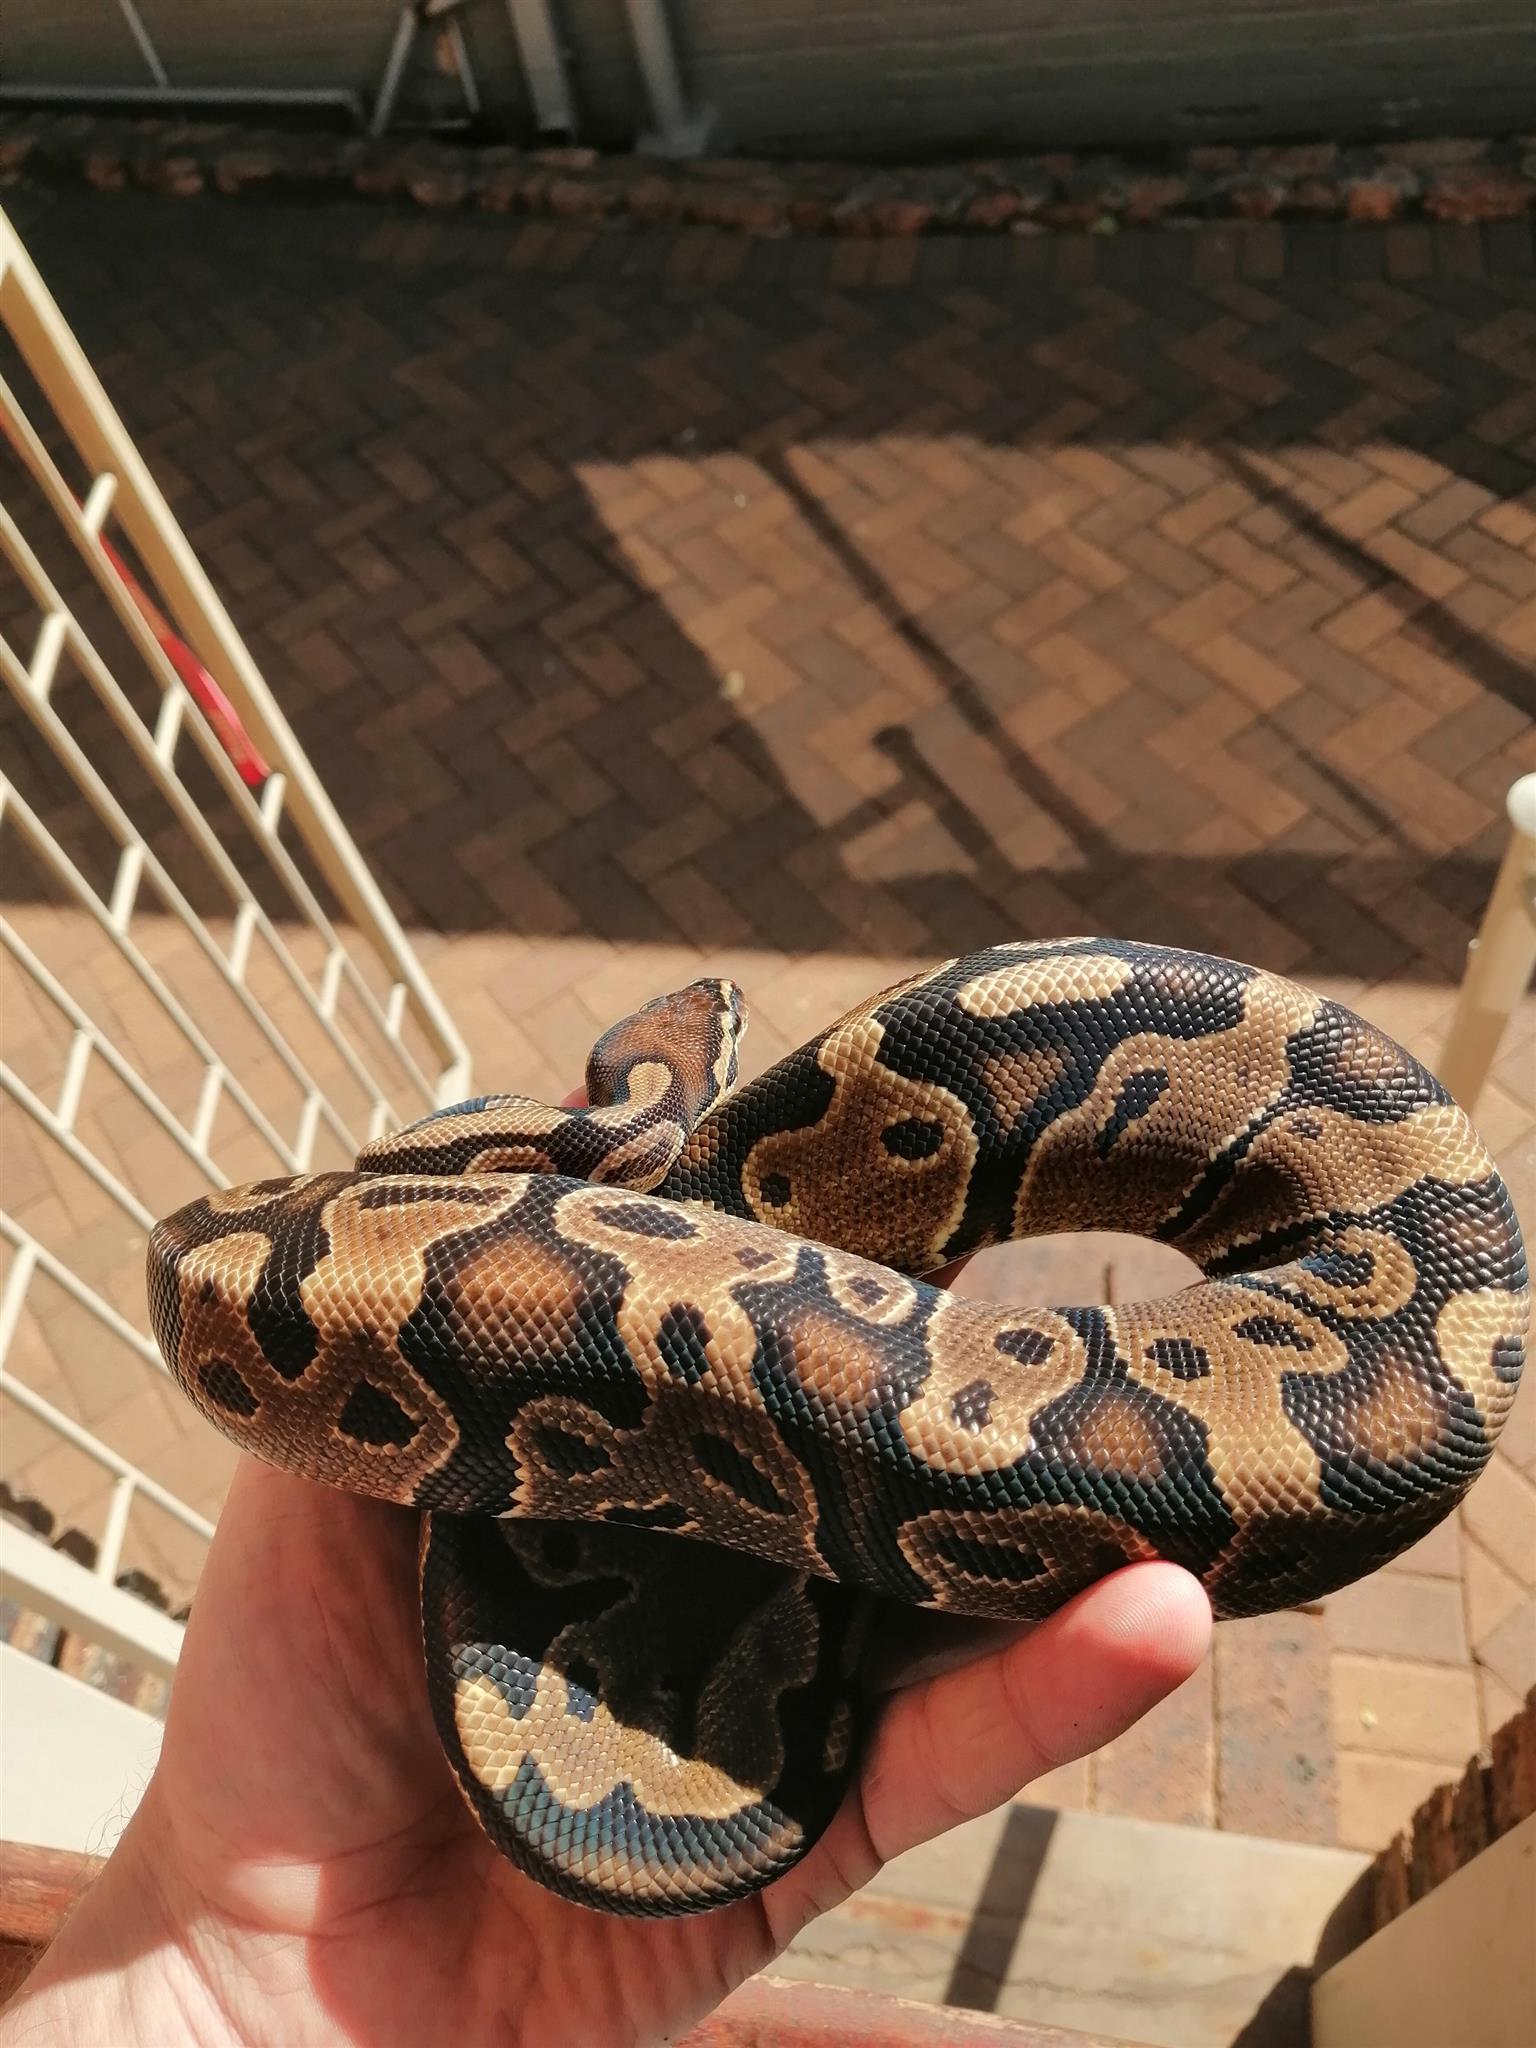 Ball python yearling